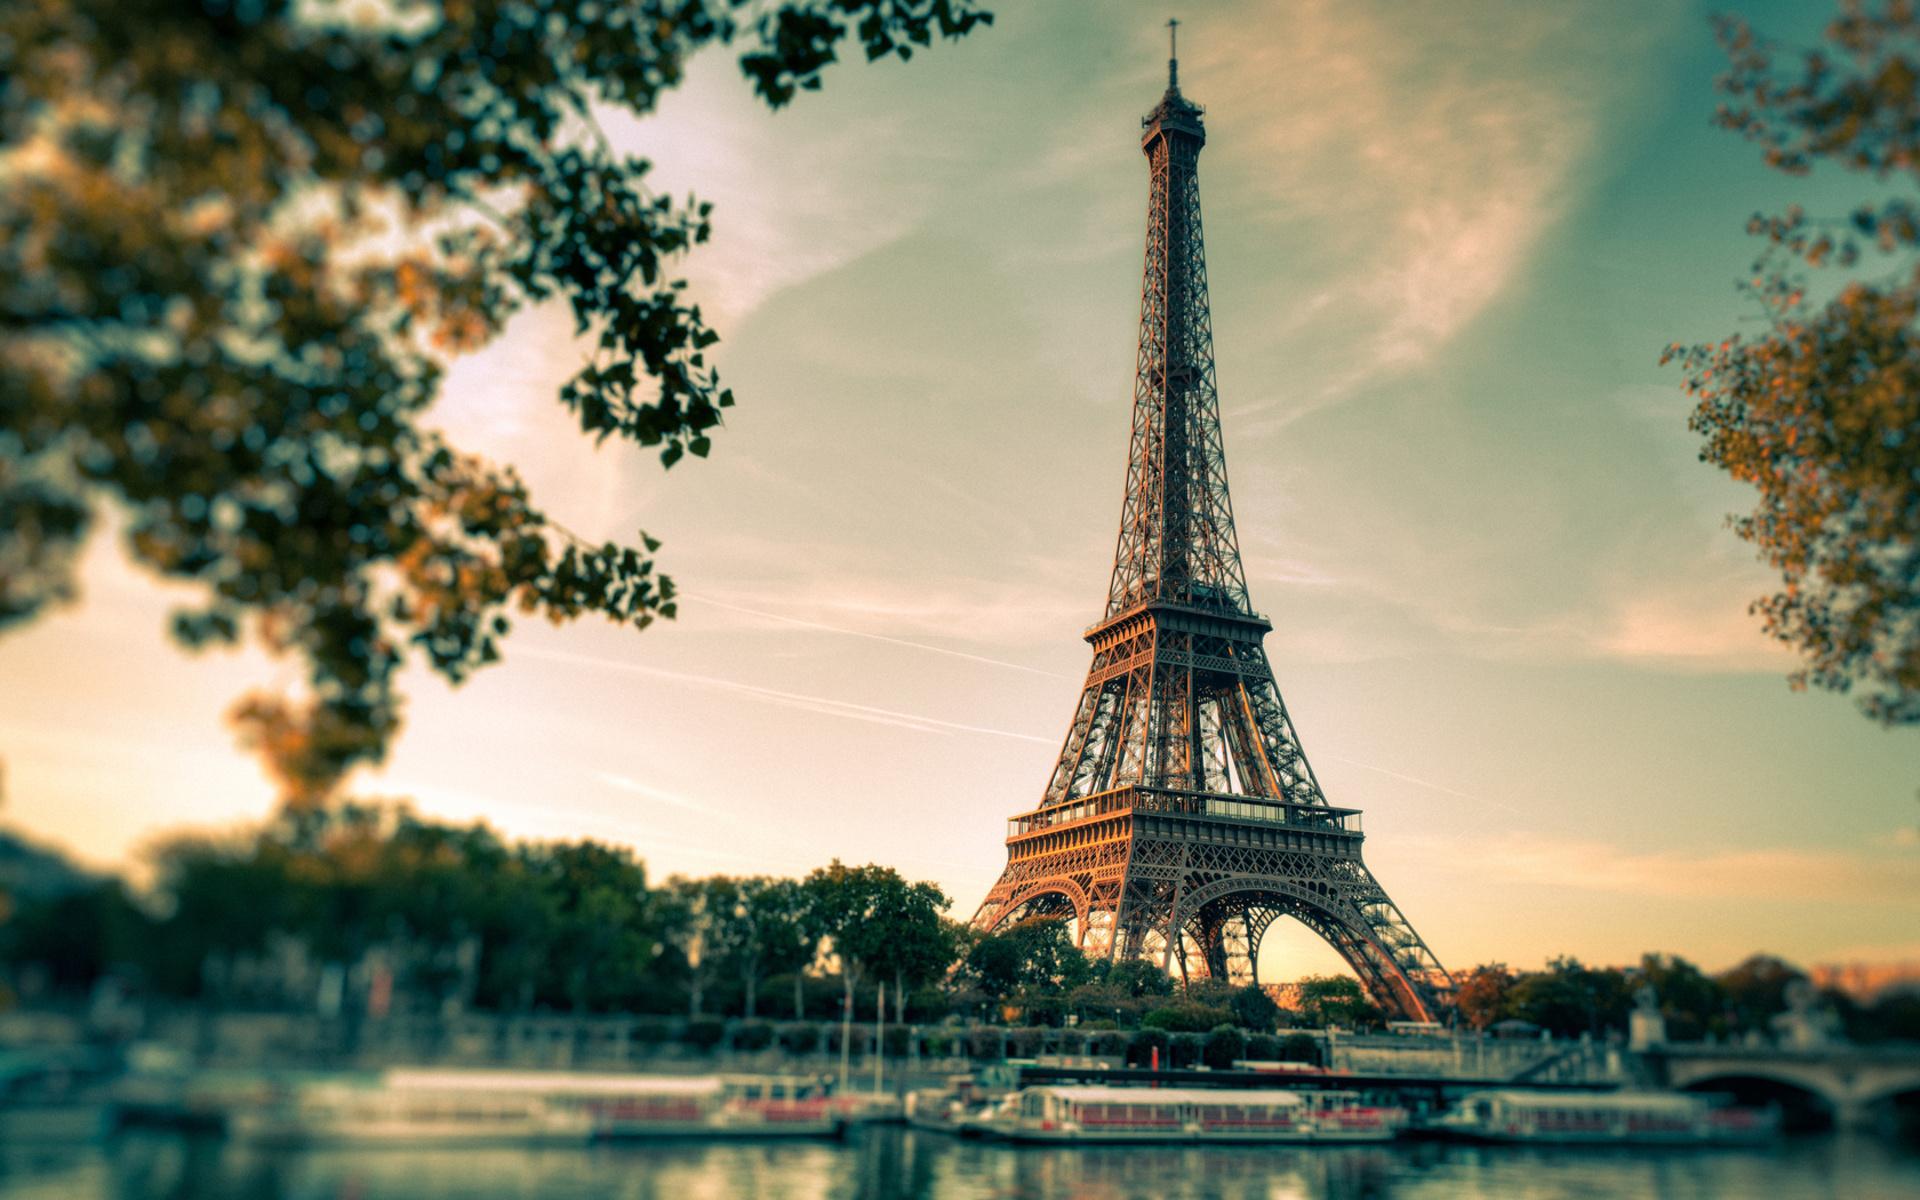 Eiffel Tower Wallpaper Hd Pixelstalk Wallpaper Iphone Spring Pinterest Bon Voyage Pink Trees And 1920x1200